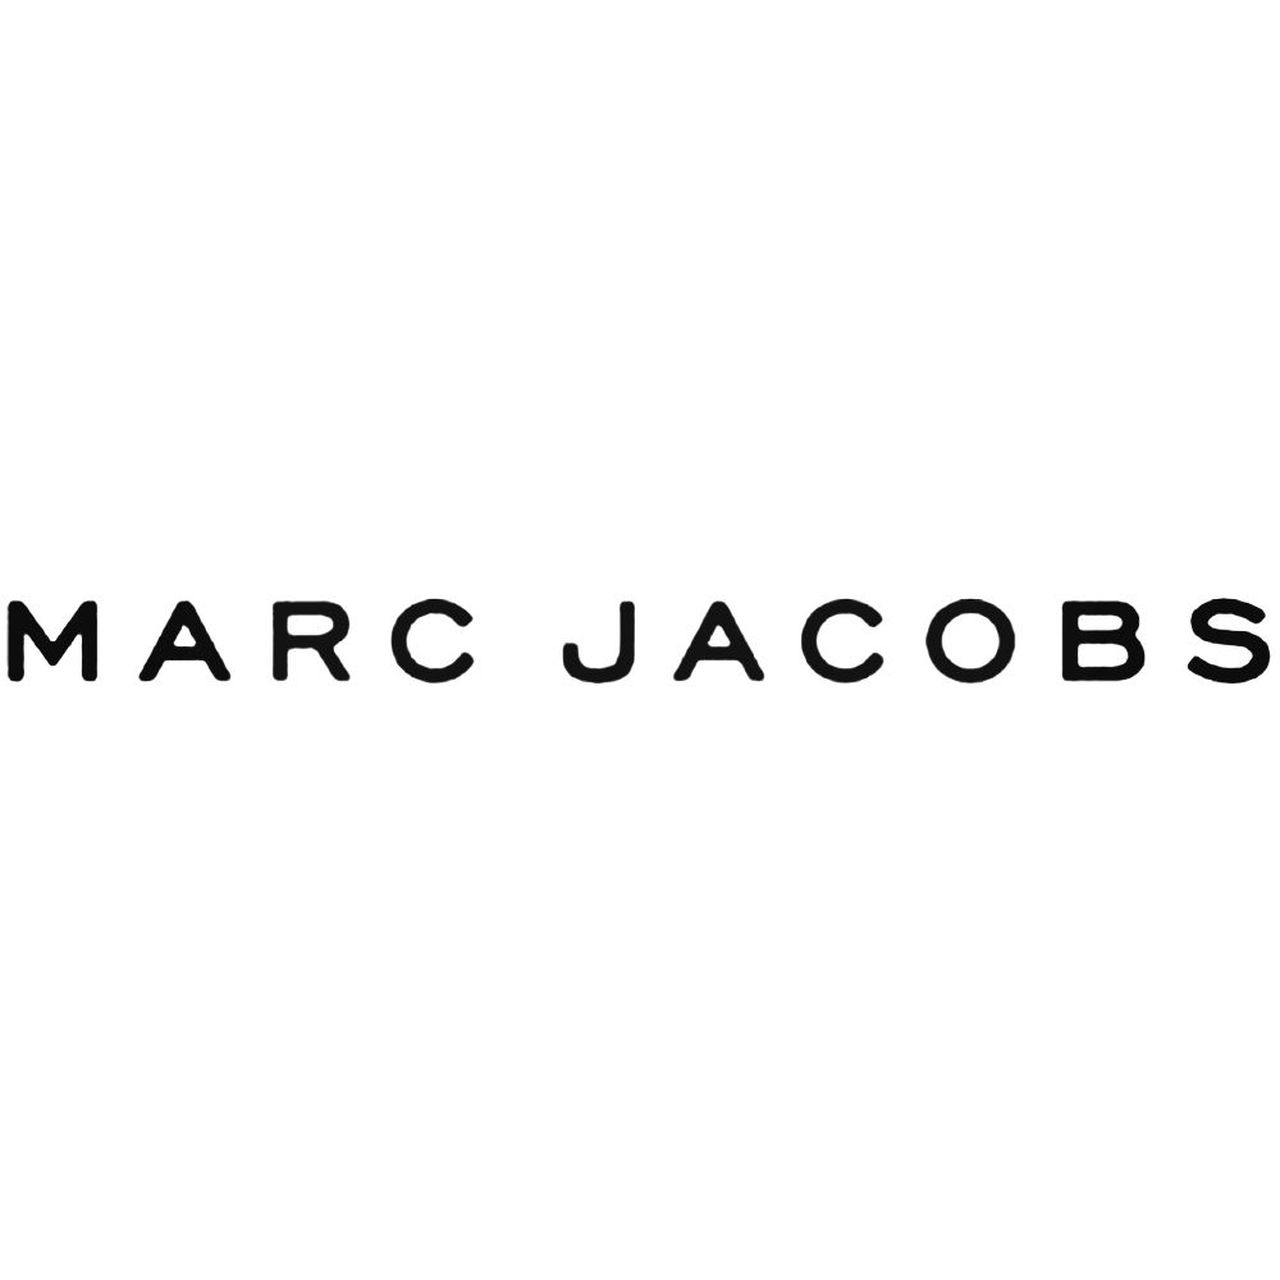 Marc-Jacobs-Logo-Decal-Sticker__23766.1510914009